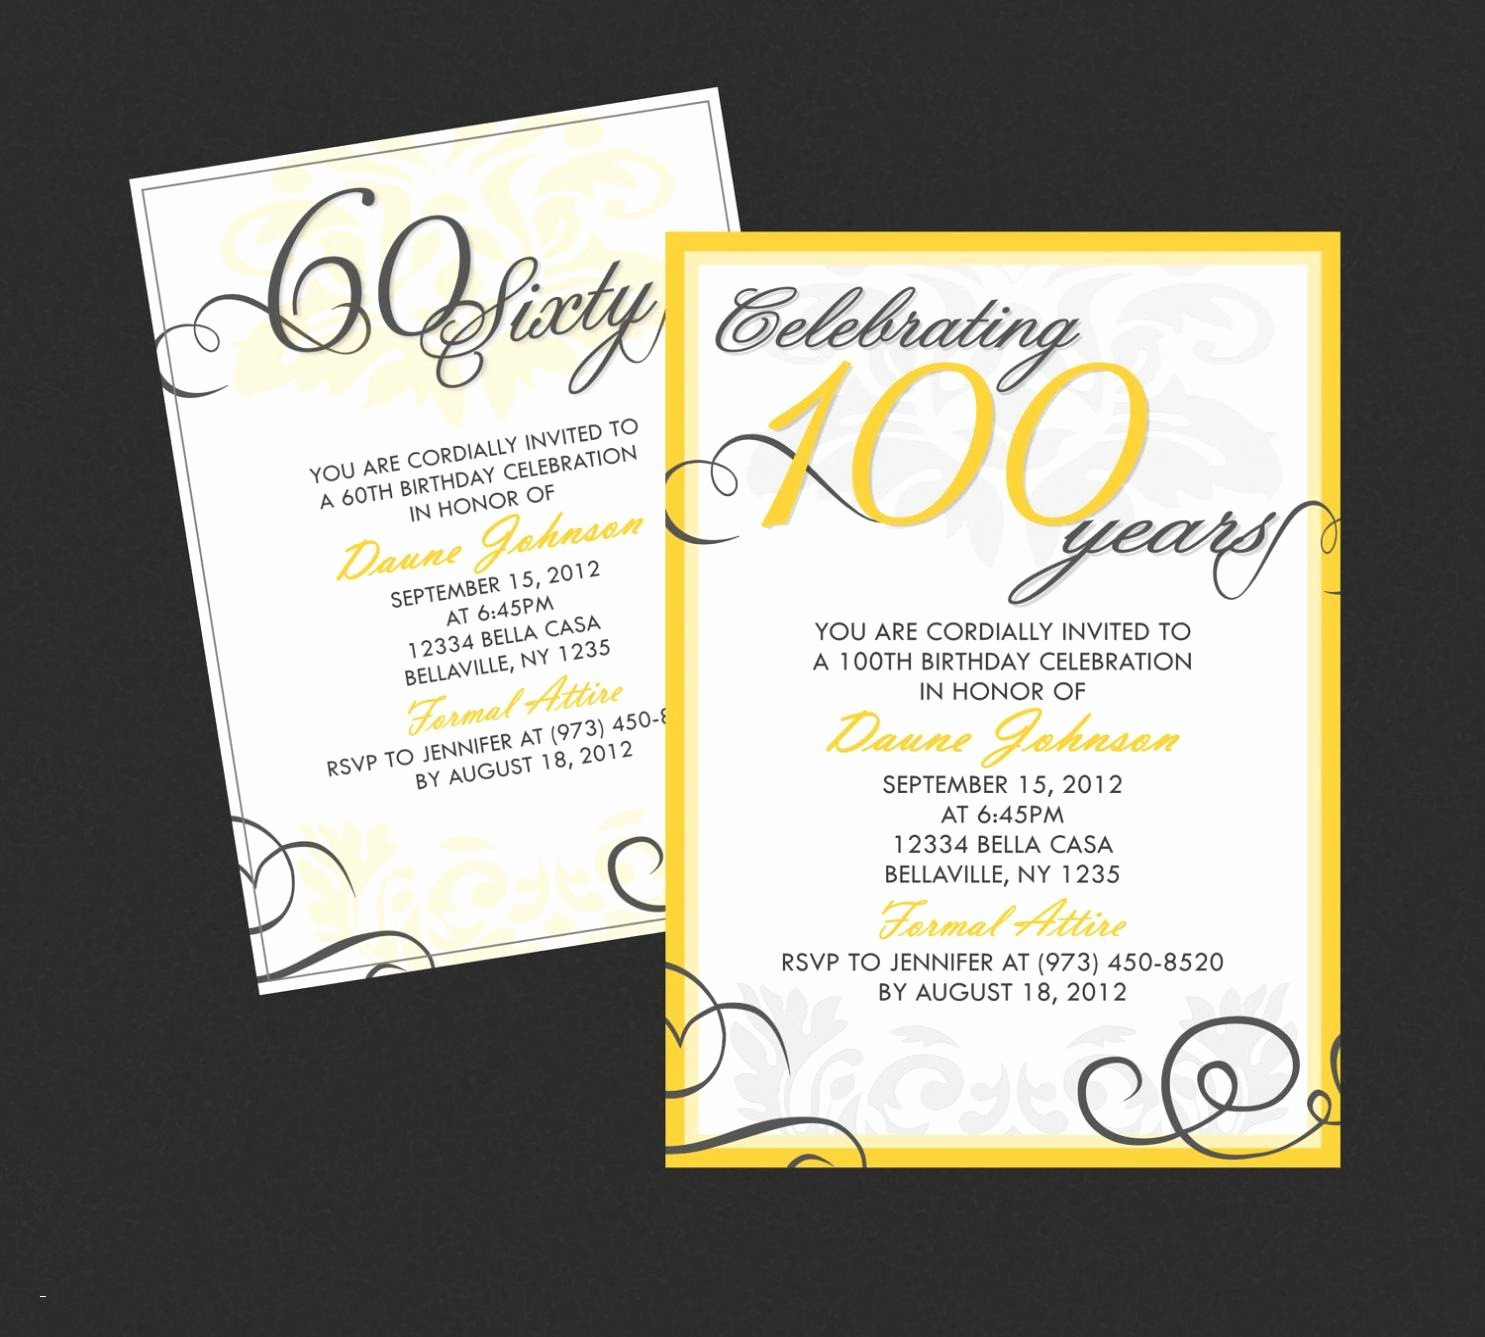 Surprise 60th Birthday Invitation Templates Free Fresh